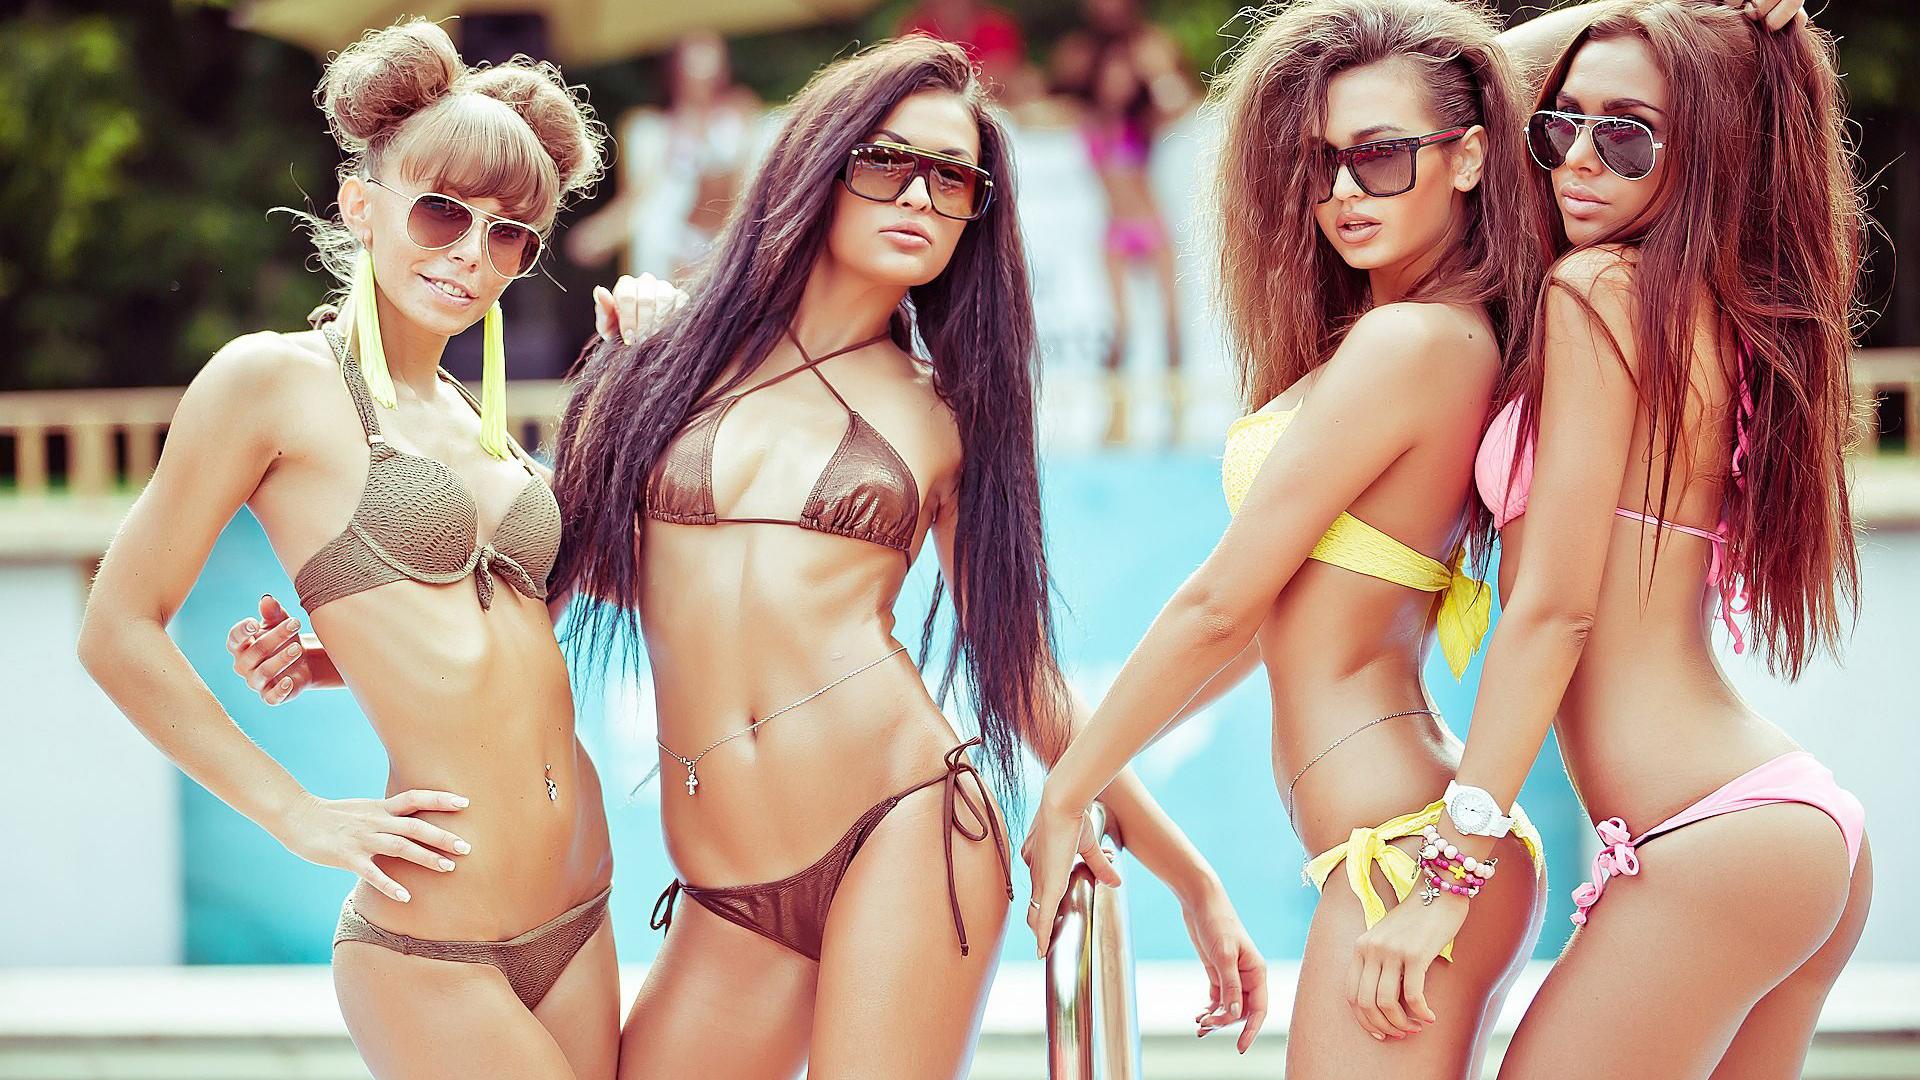 Amazon.com: Bikini Girls EU Wallpapers: Appstore For Android